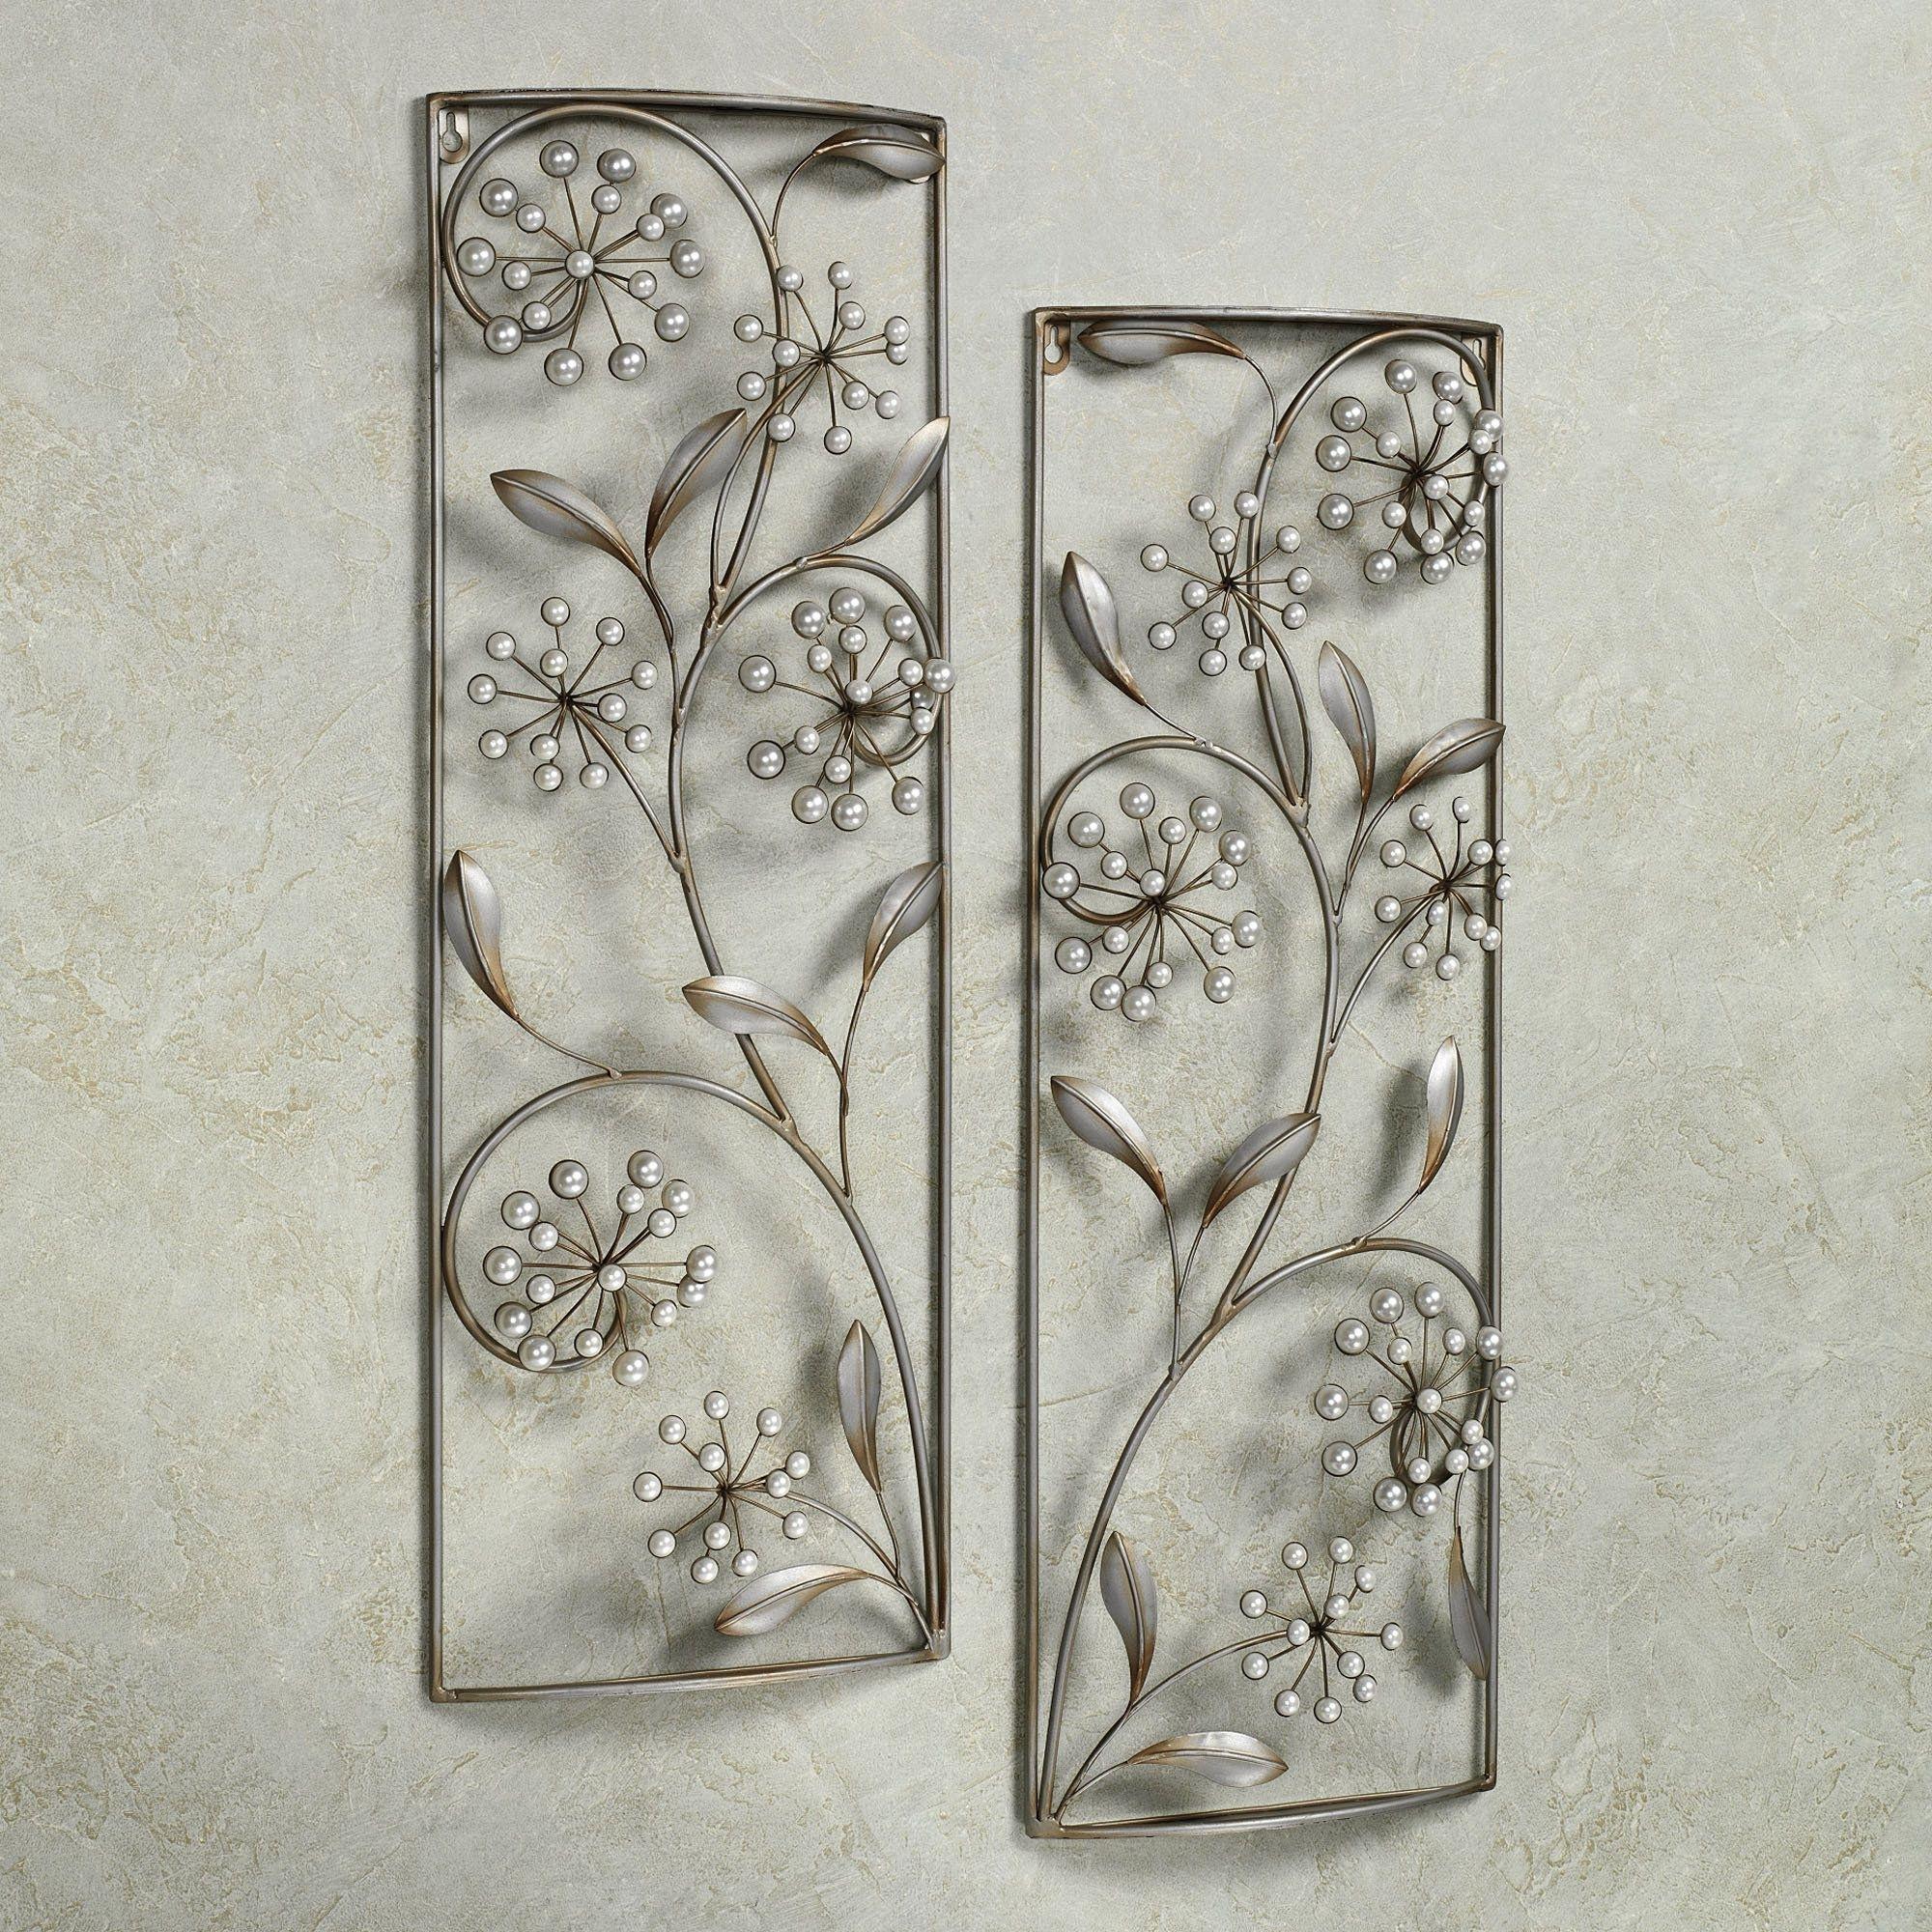 Pearlette Metal Wall Art Panel Set | Ramy Ornamenty | Pinterest intended for Metal Wall Art Panels (Image 17 of 20)